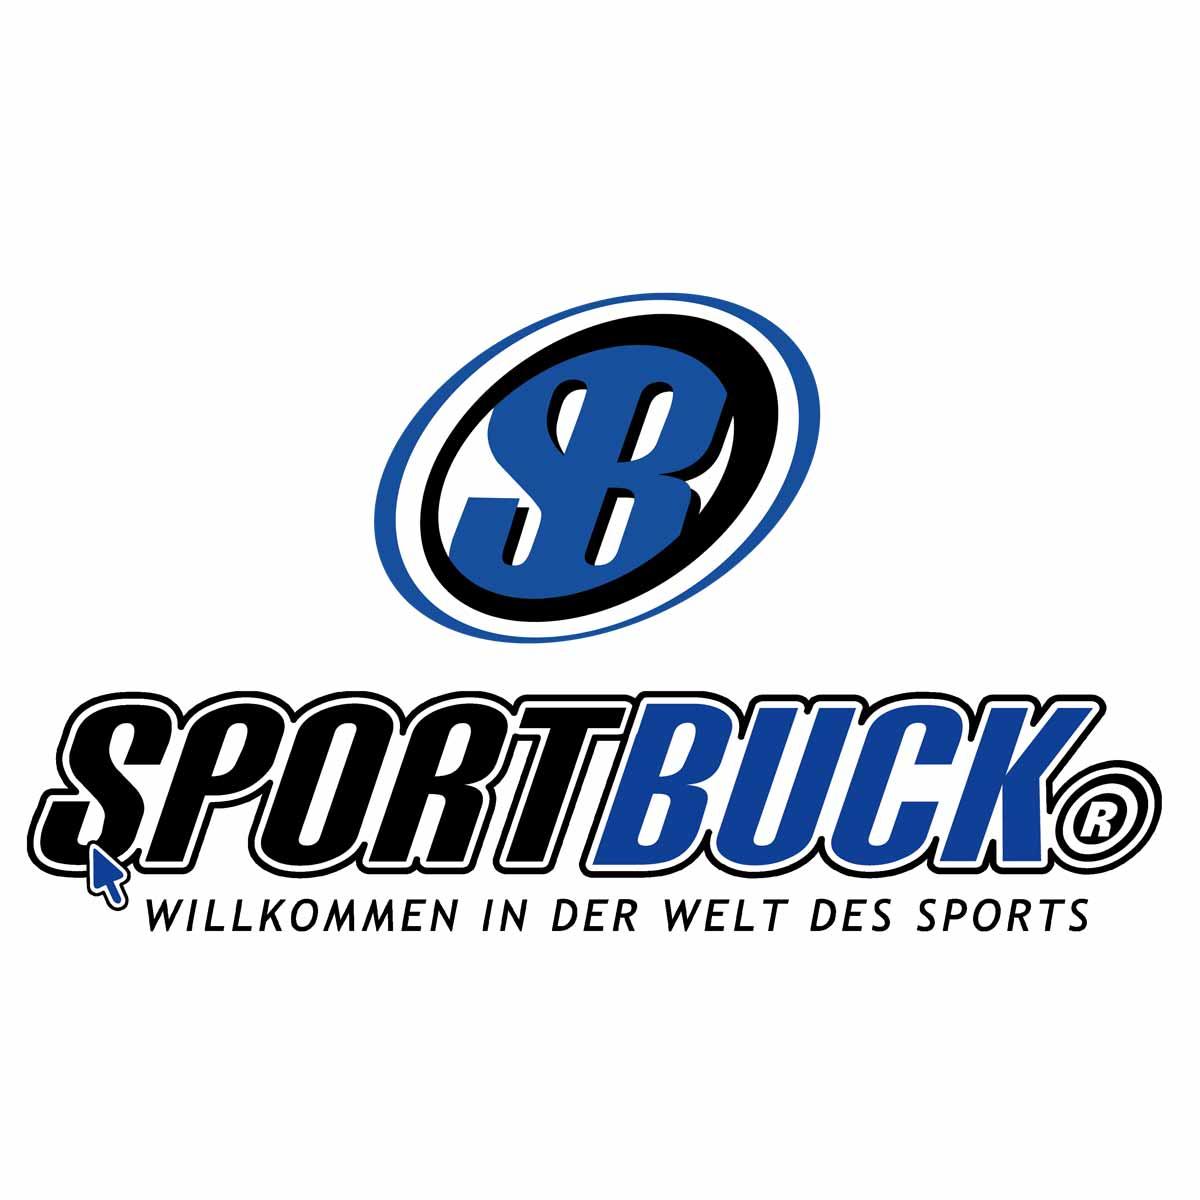 Sportbuck Com Gunstige Preise Fur Sportartikel Sportuhren